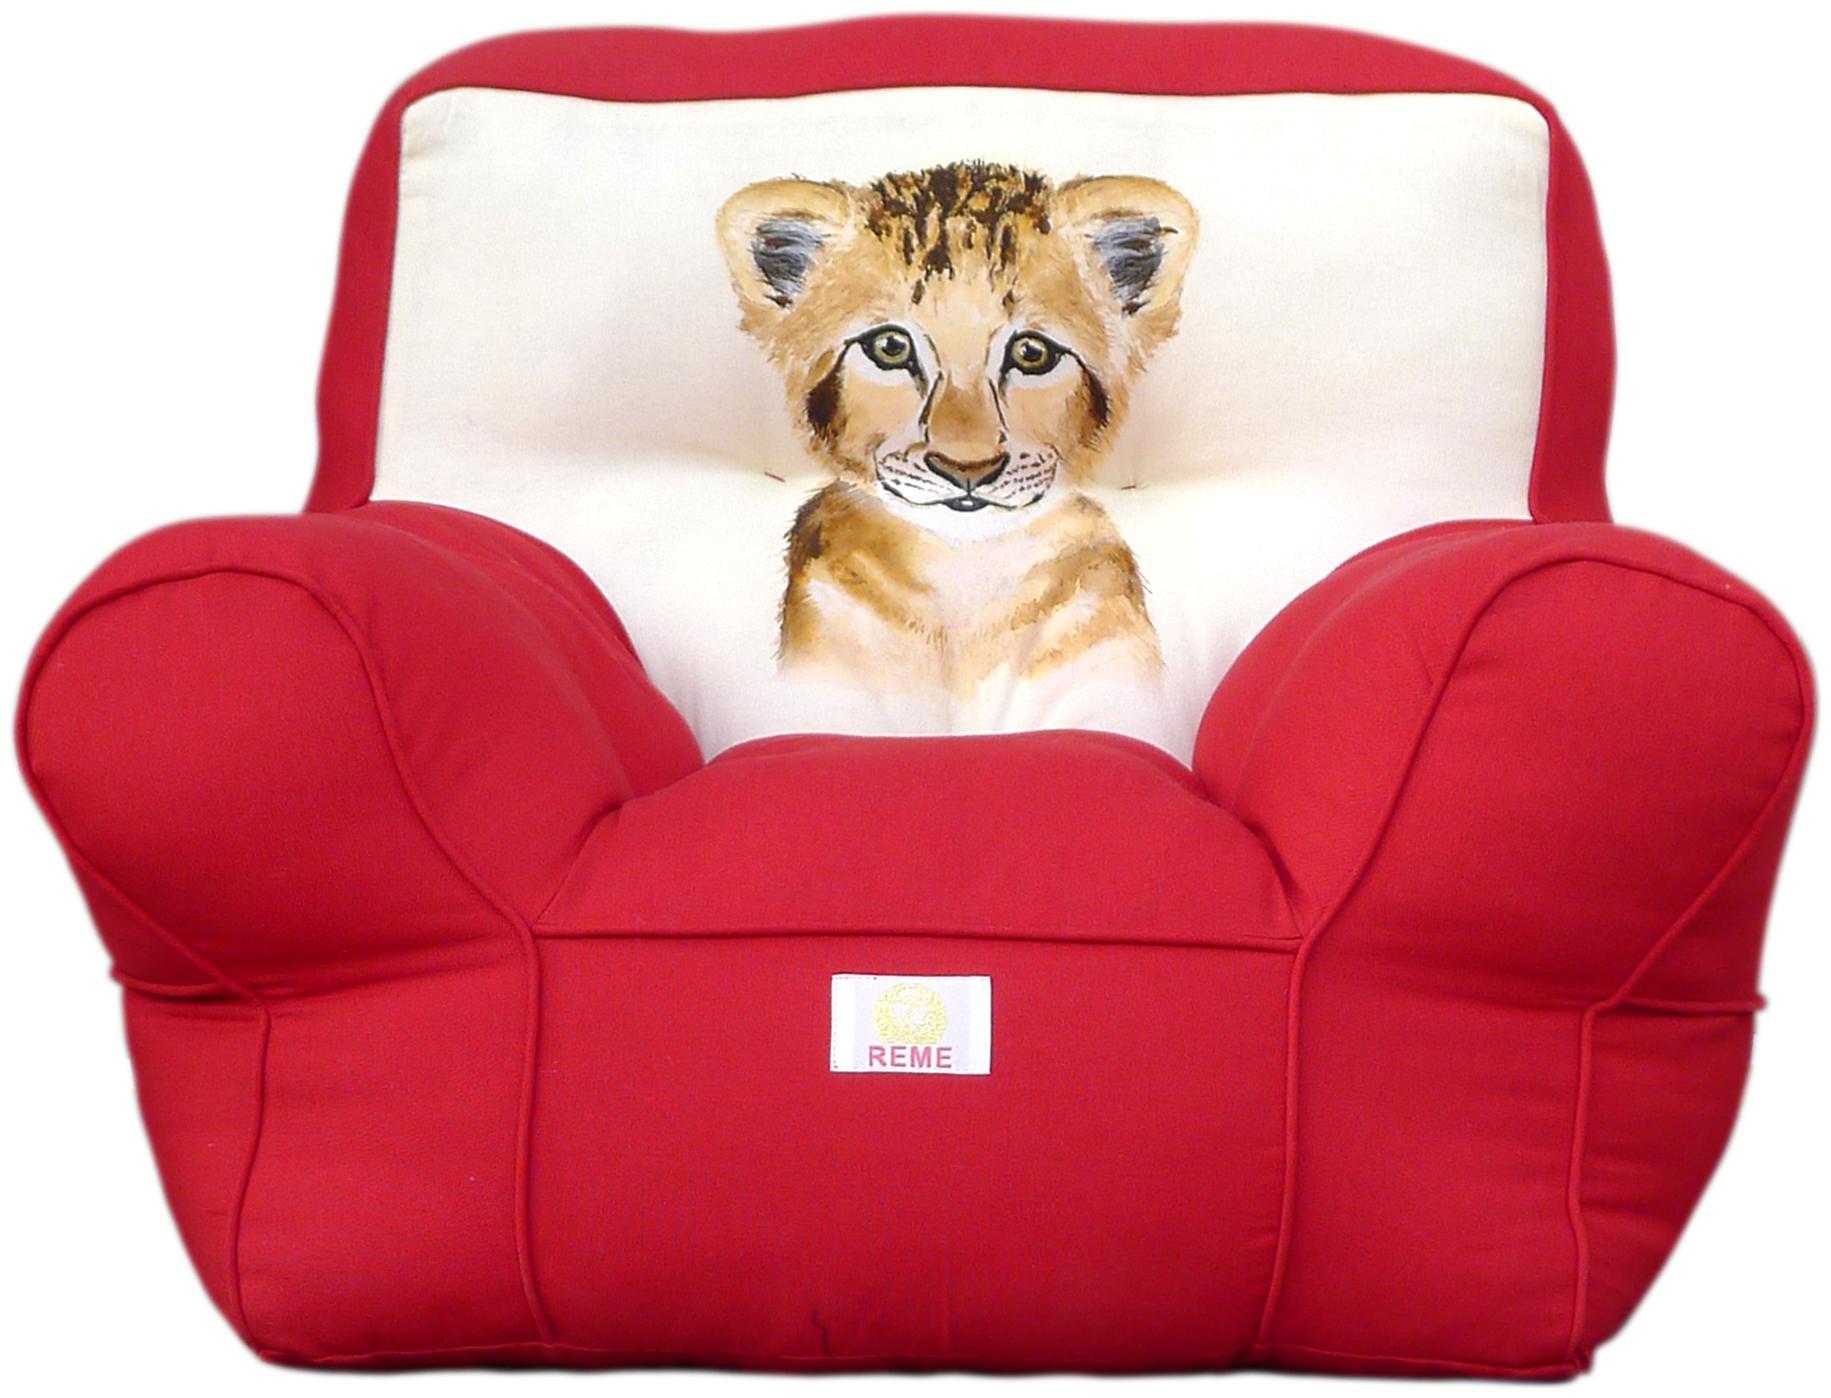 Reme High Quality Organic Cotton Comfortable Sofa Kid's Sofa (Red)